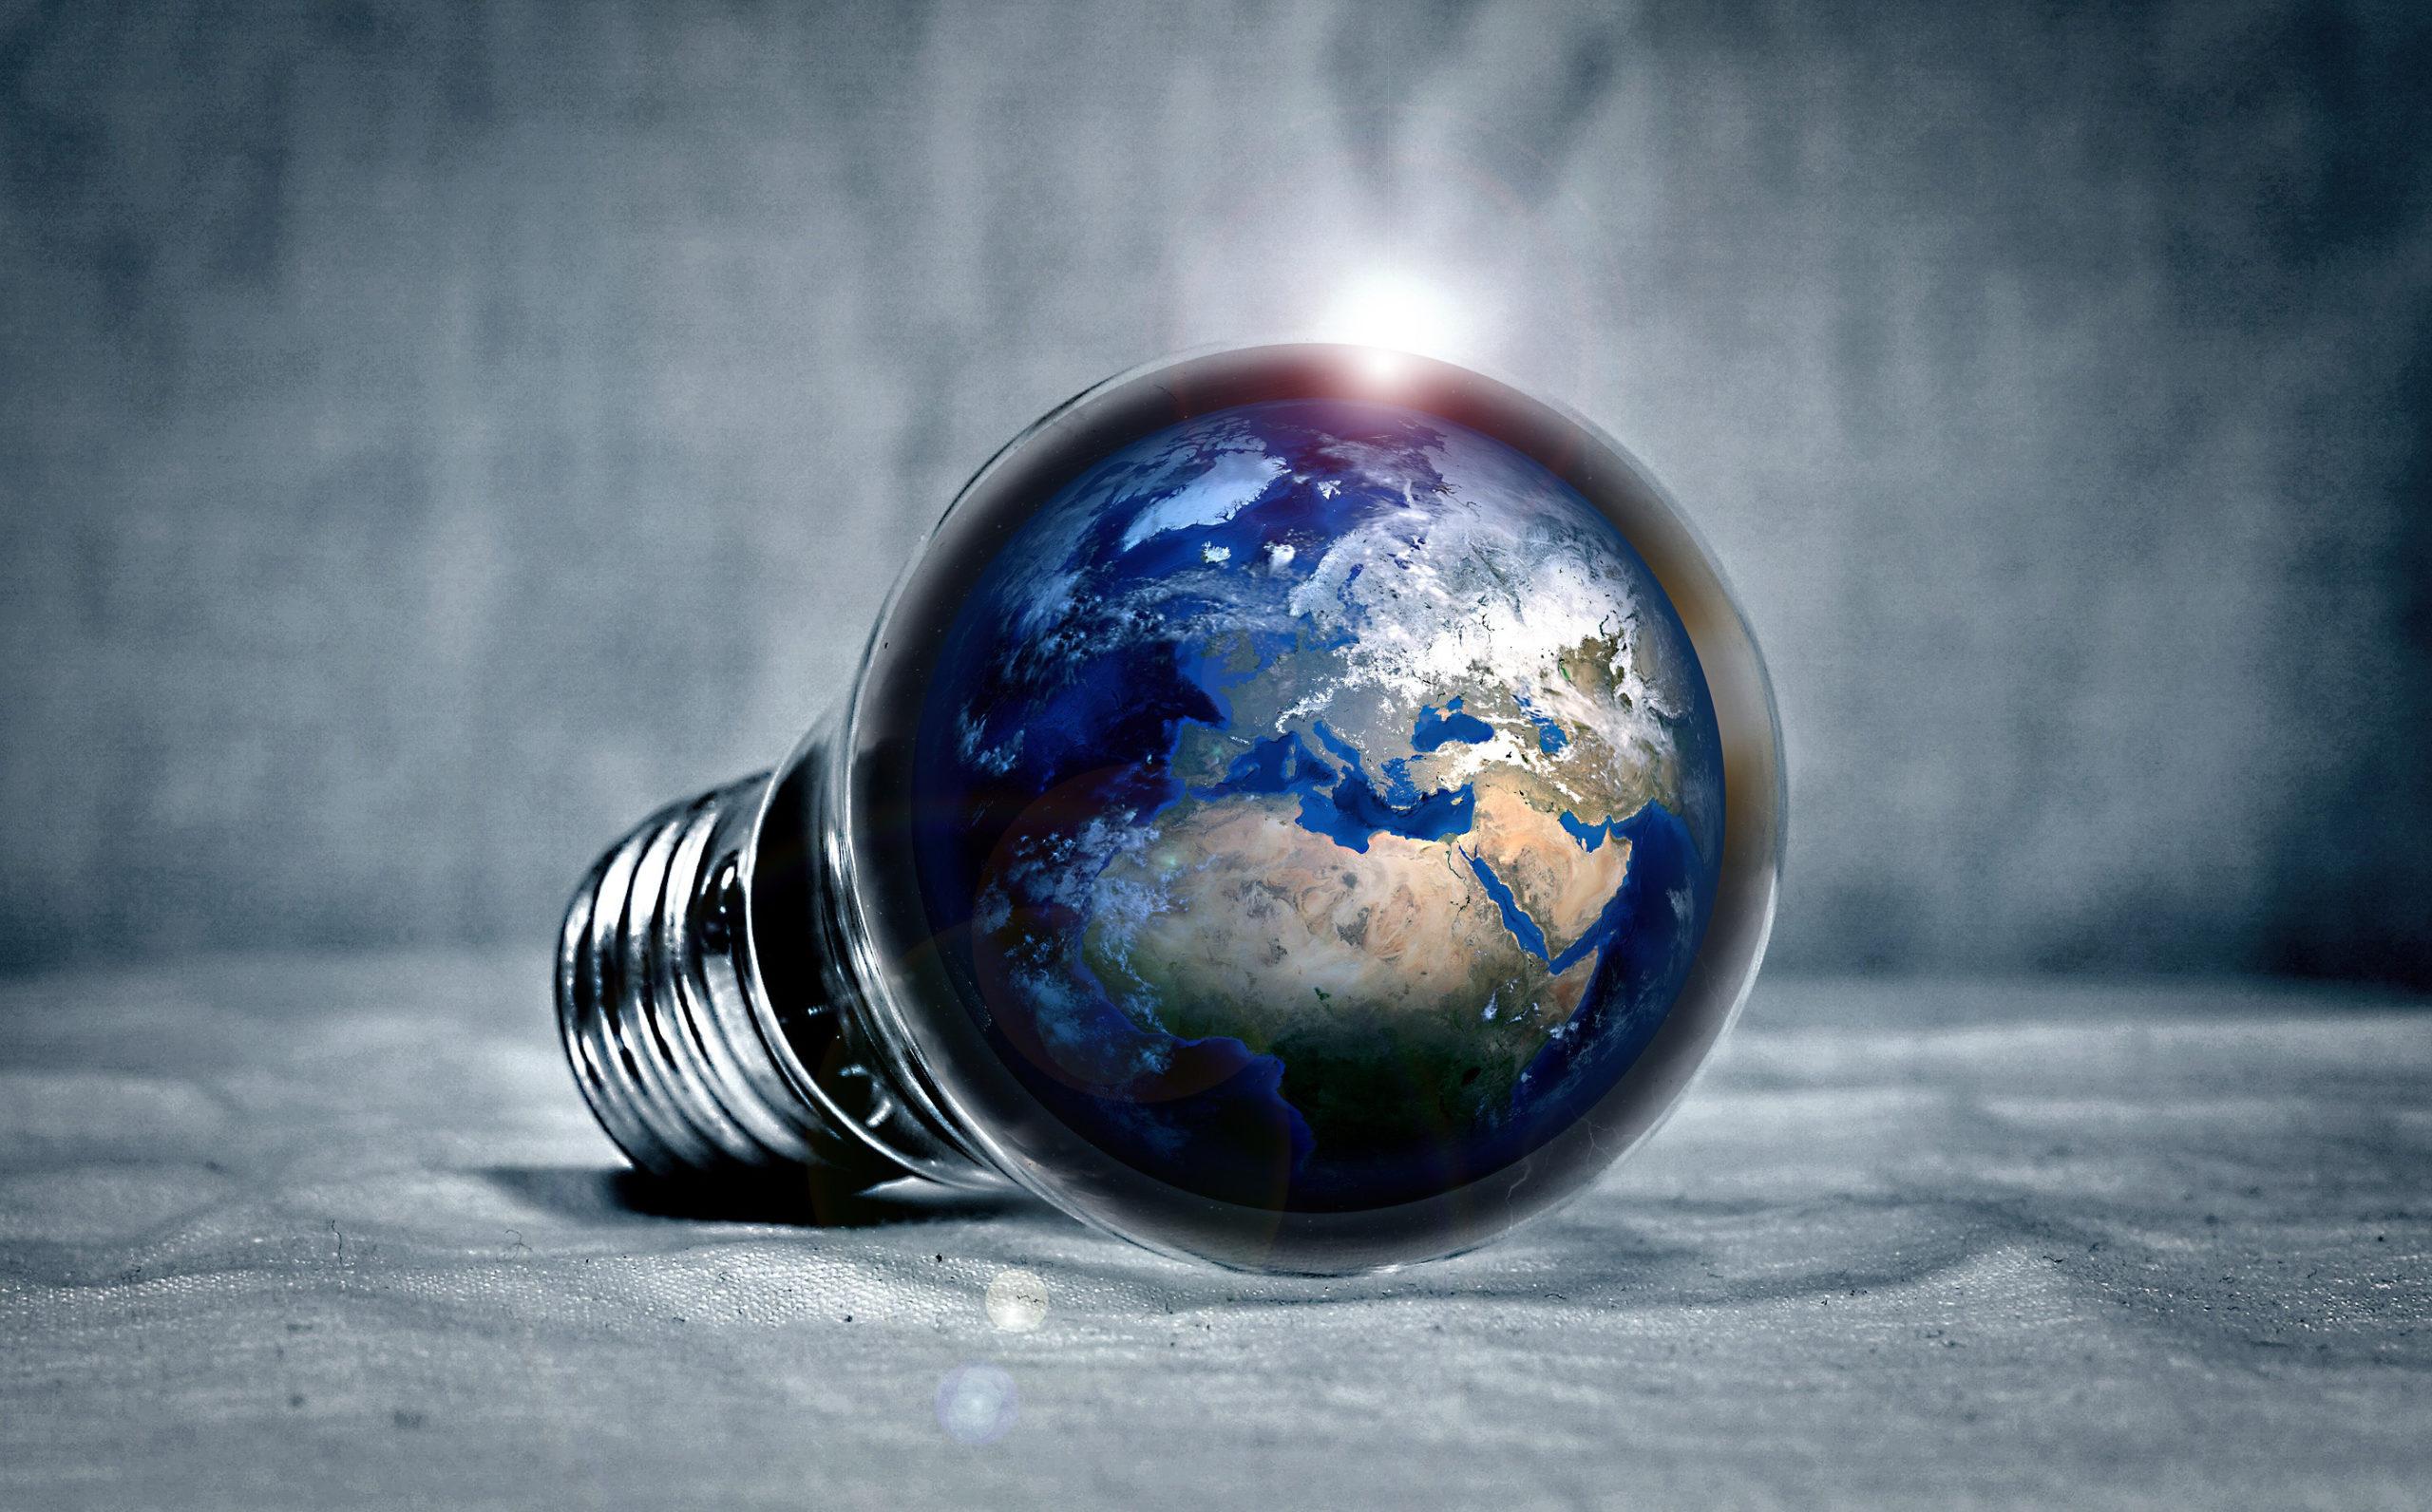 Earth inside a lightbulb. Photo by PIRO4D/Goodfreephotos.com